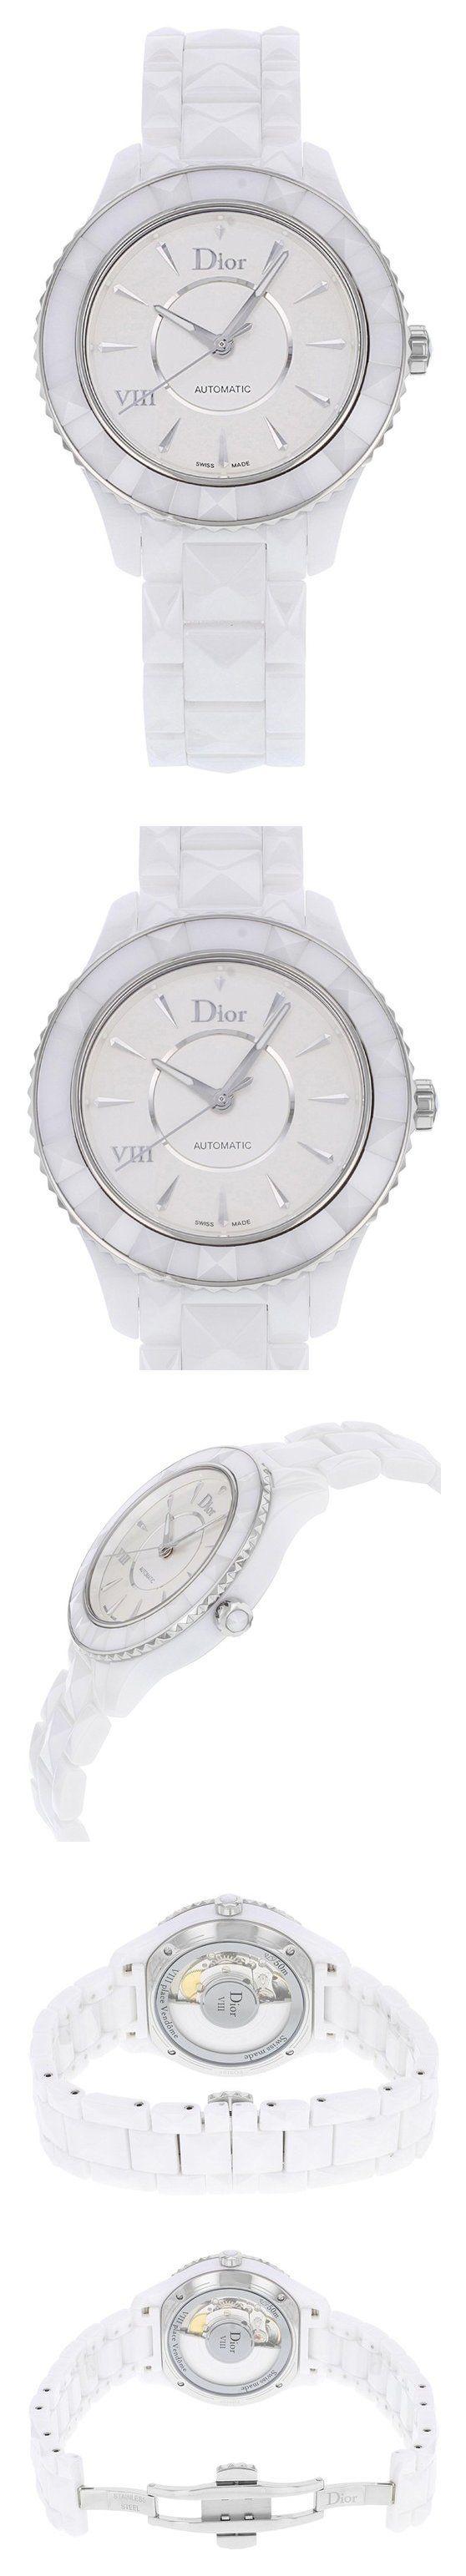 Christian Dior VIII CD1245E3C001 #watch #christiandior #wrist_watches #watches #women #departments #shops